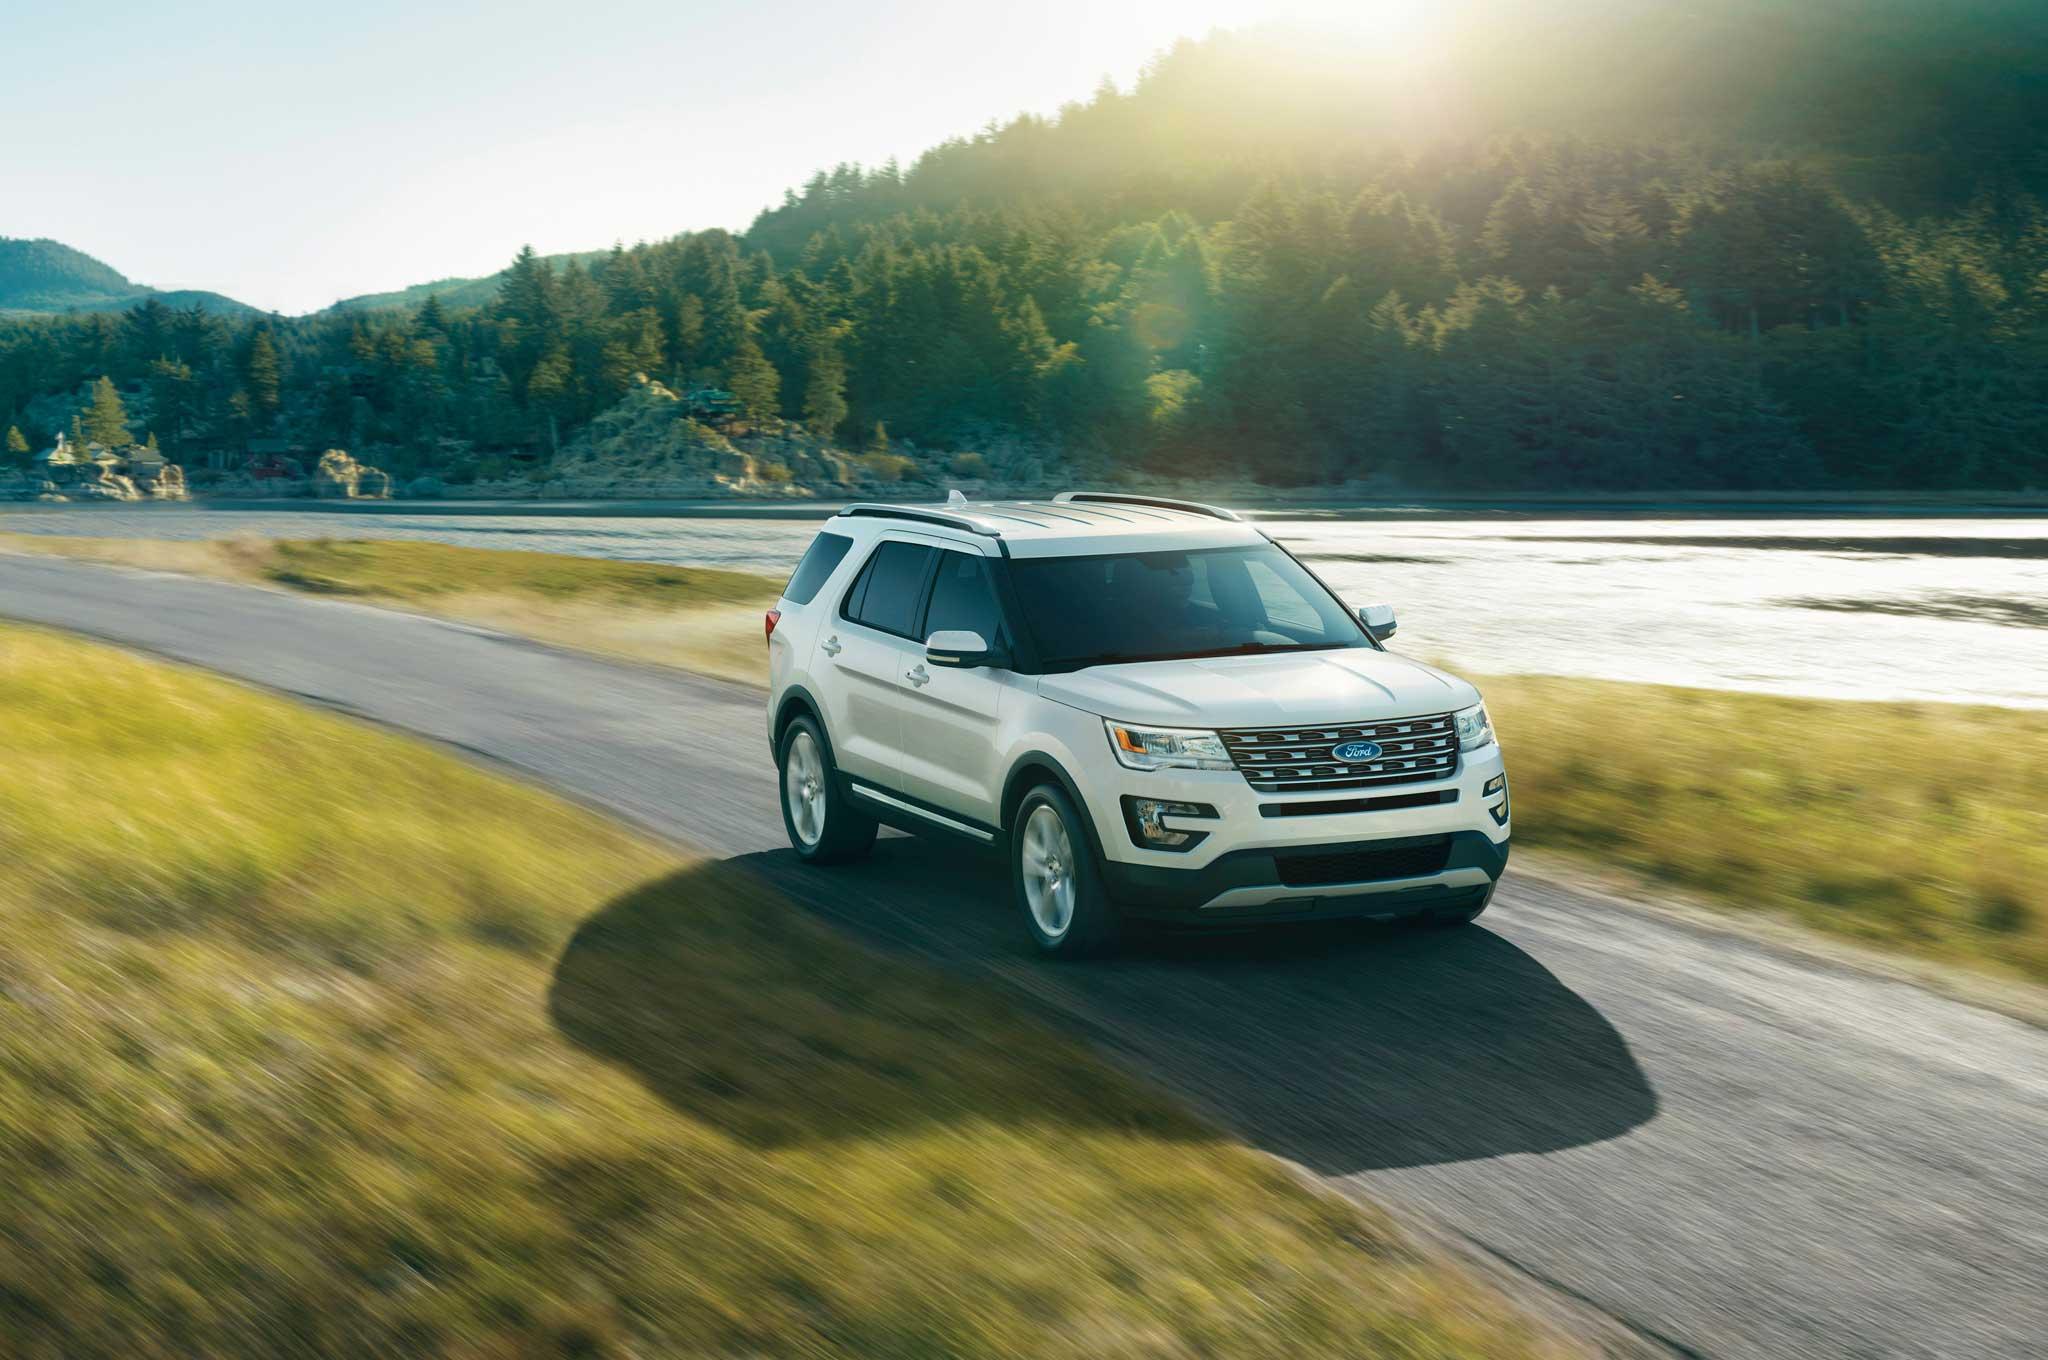 2016-ford-explorer-passenger-side-front-view